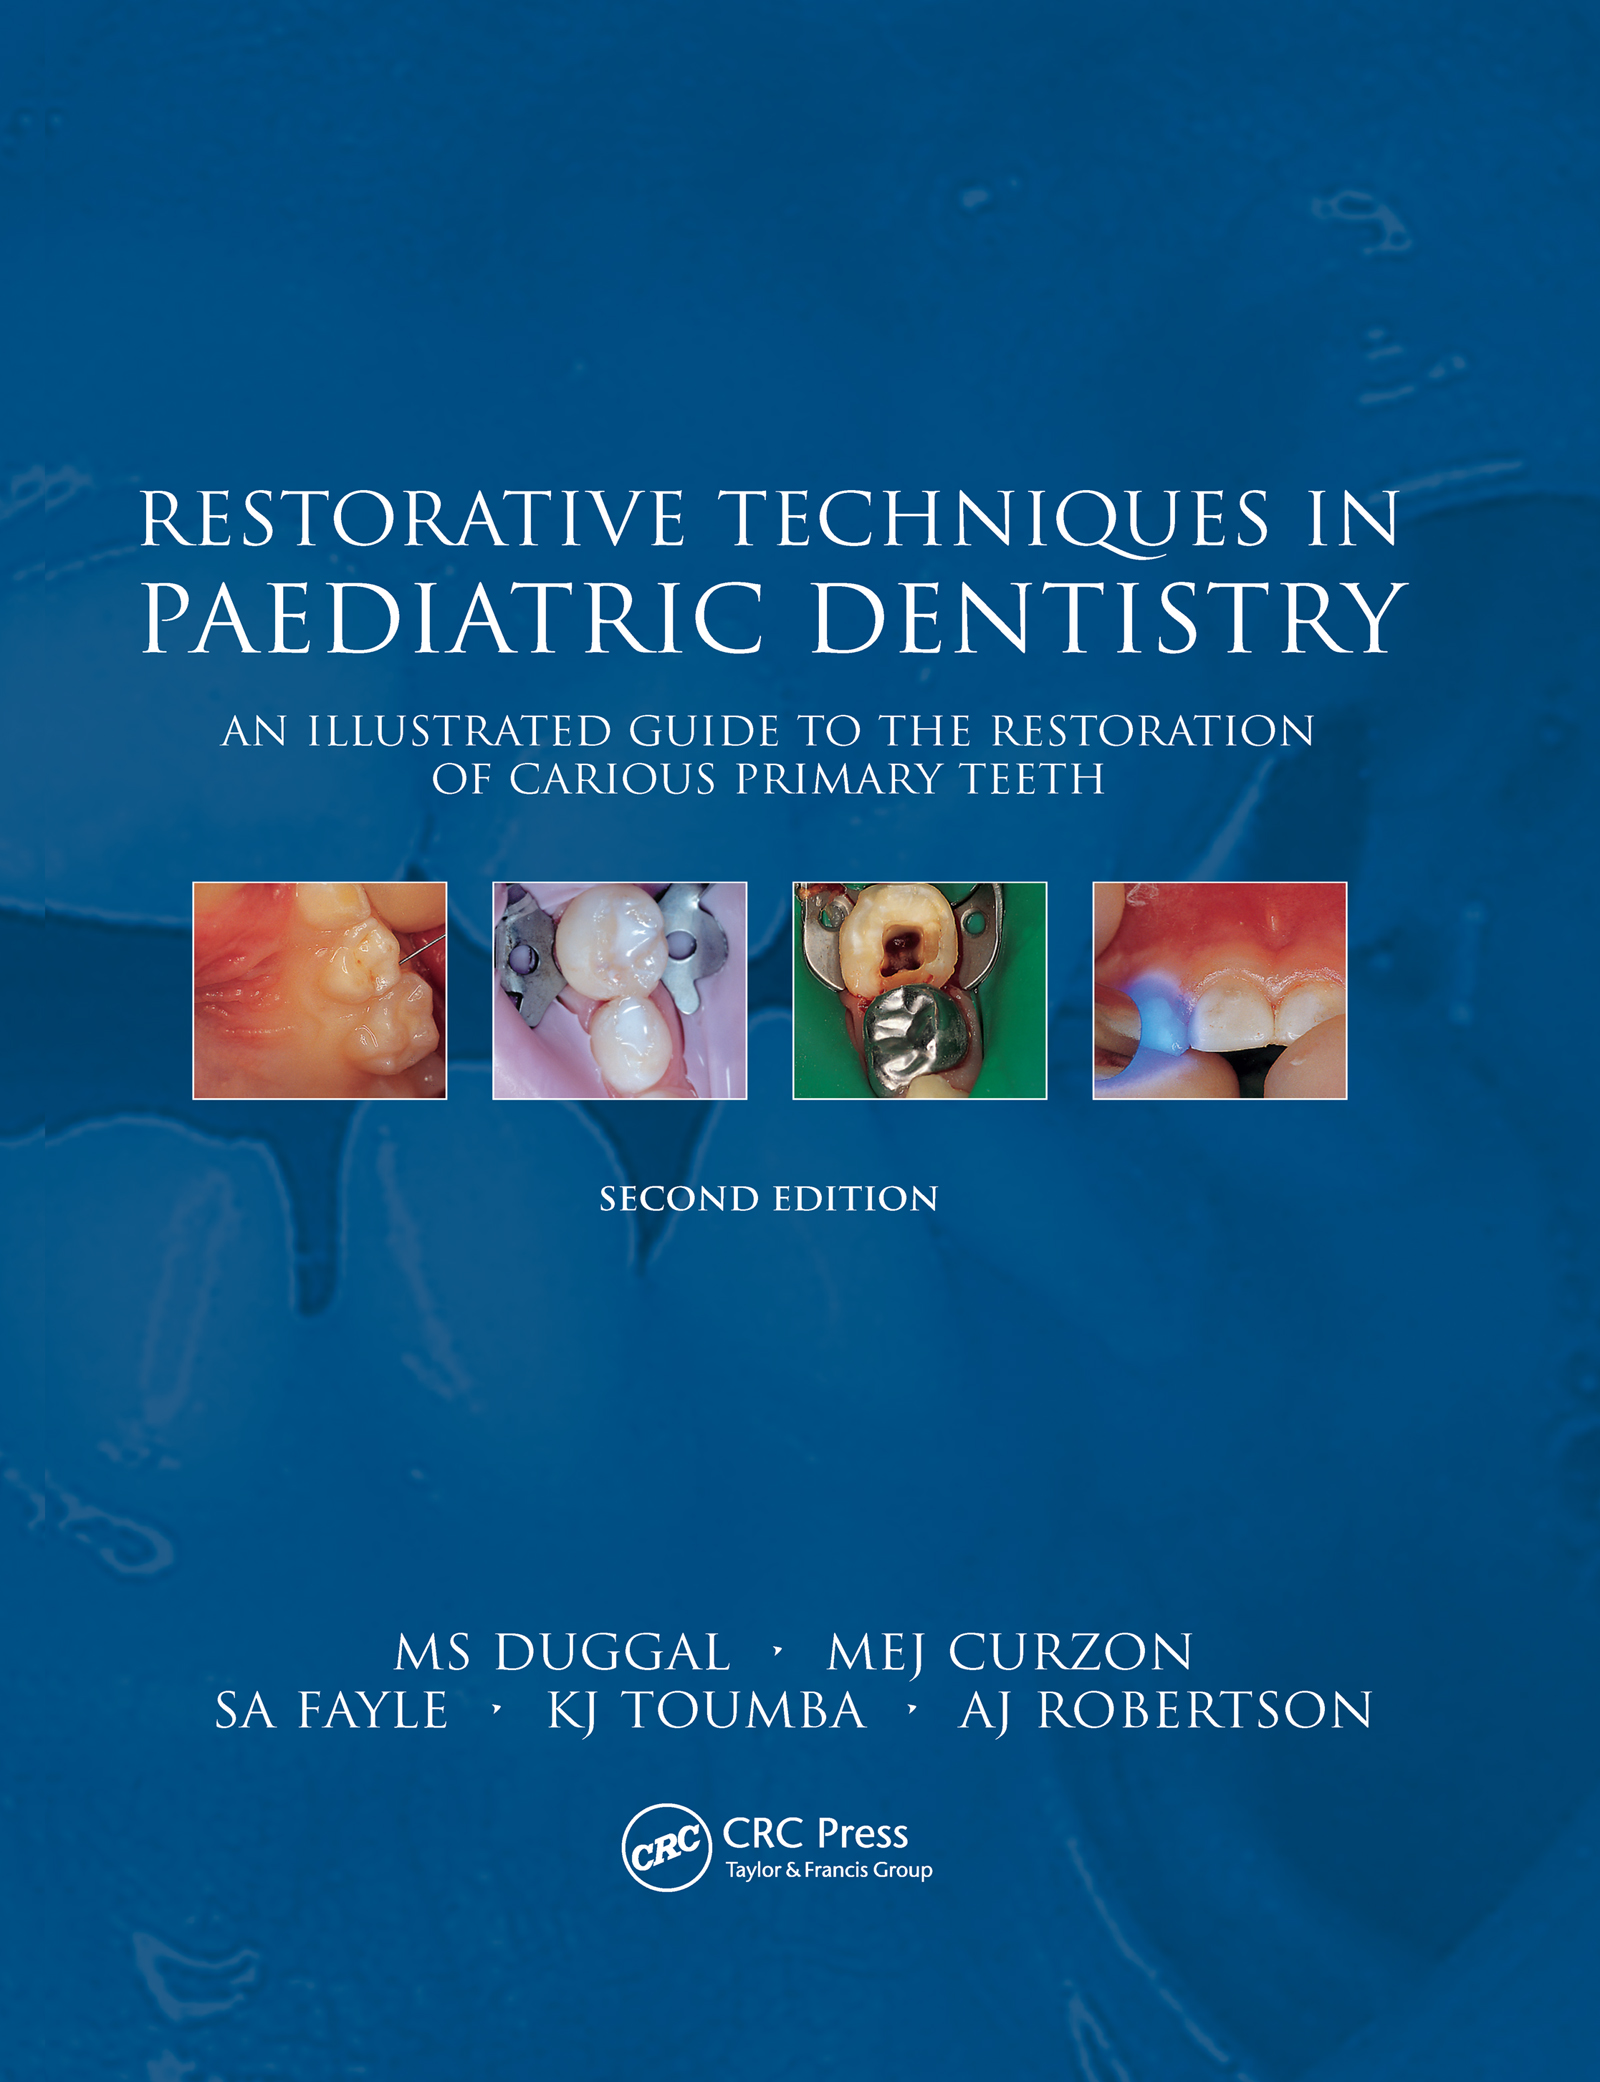 Restorative Techniques in Paediatric Dentistry